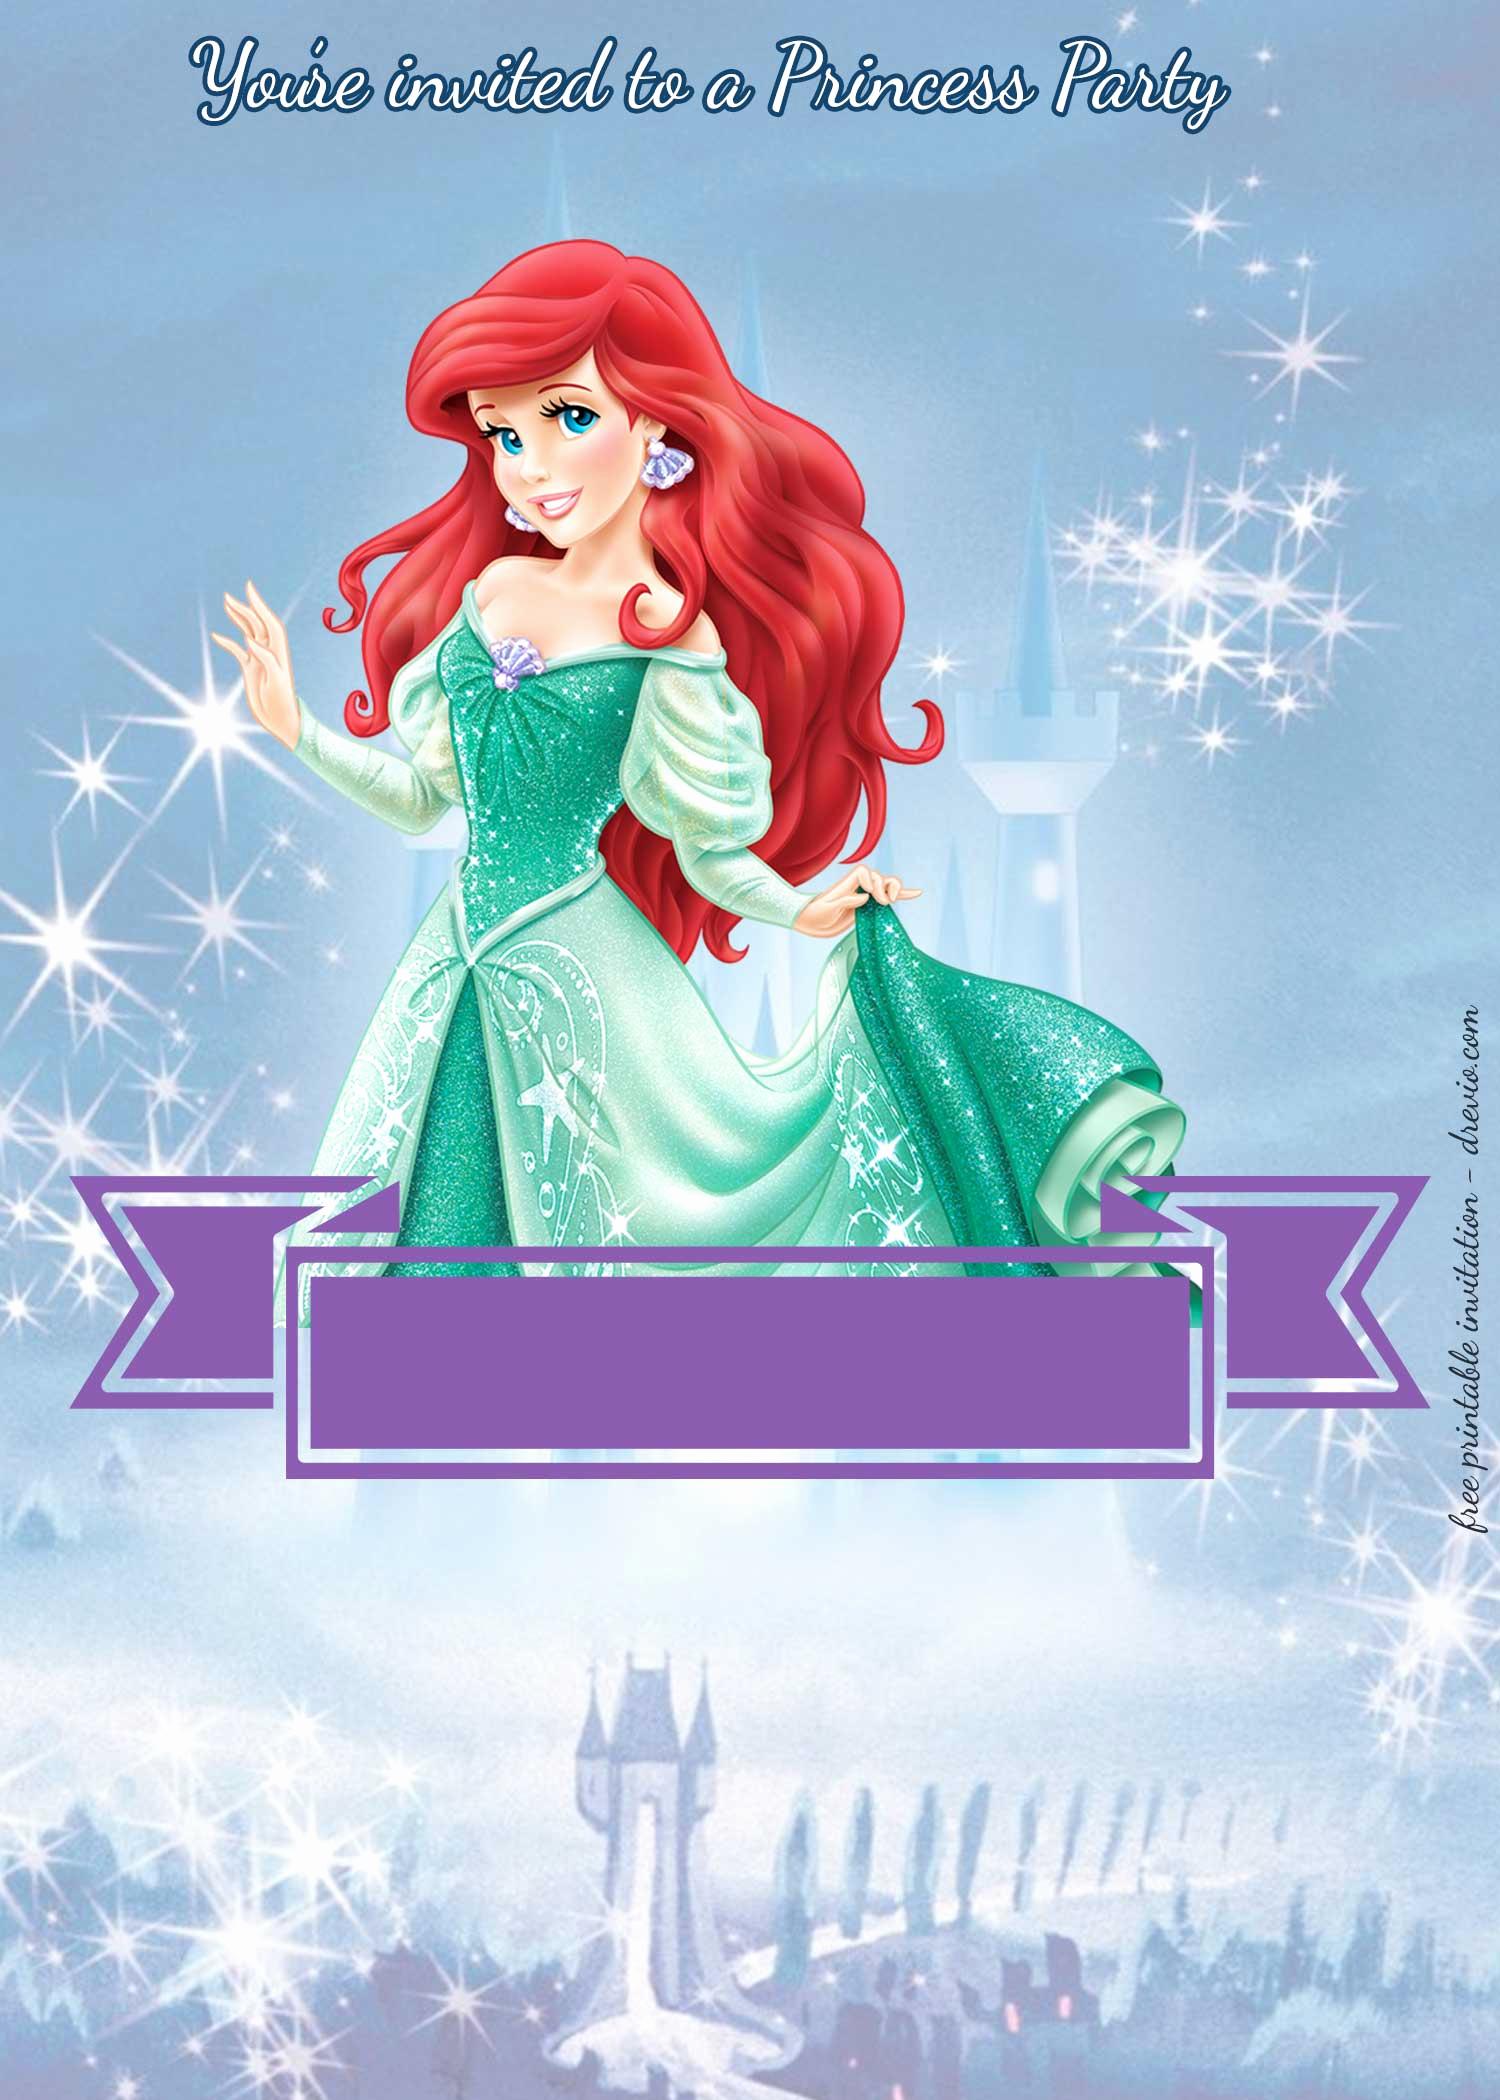 Ariel Invitation Template Free Best Of Free Princess Party Birthday Invitation Templates